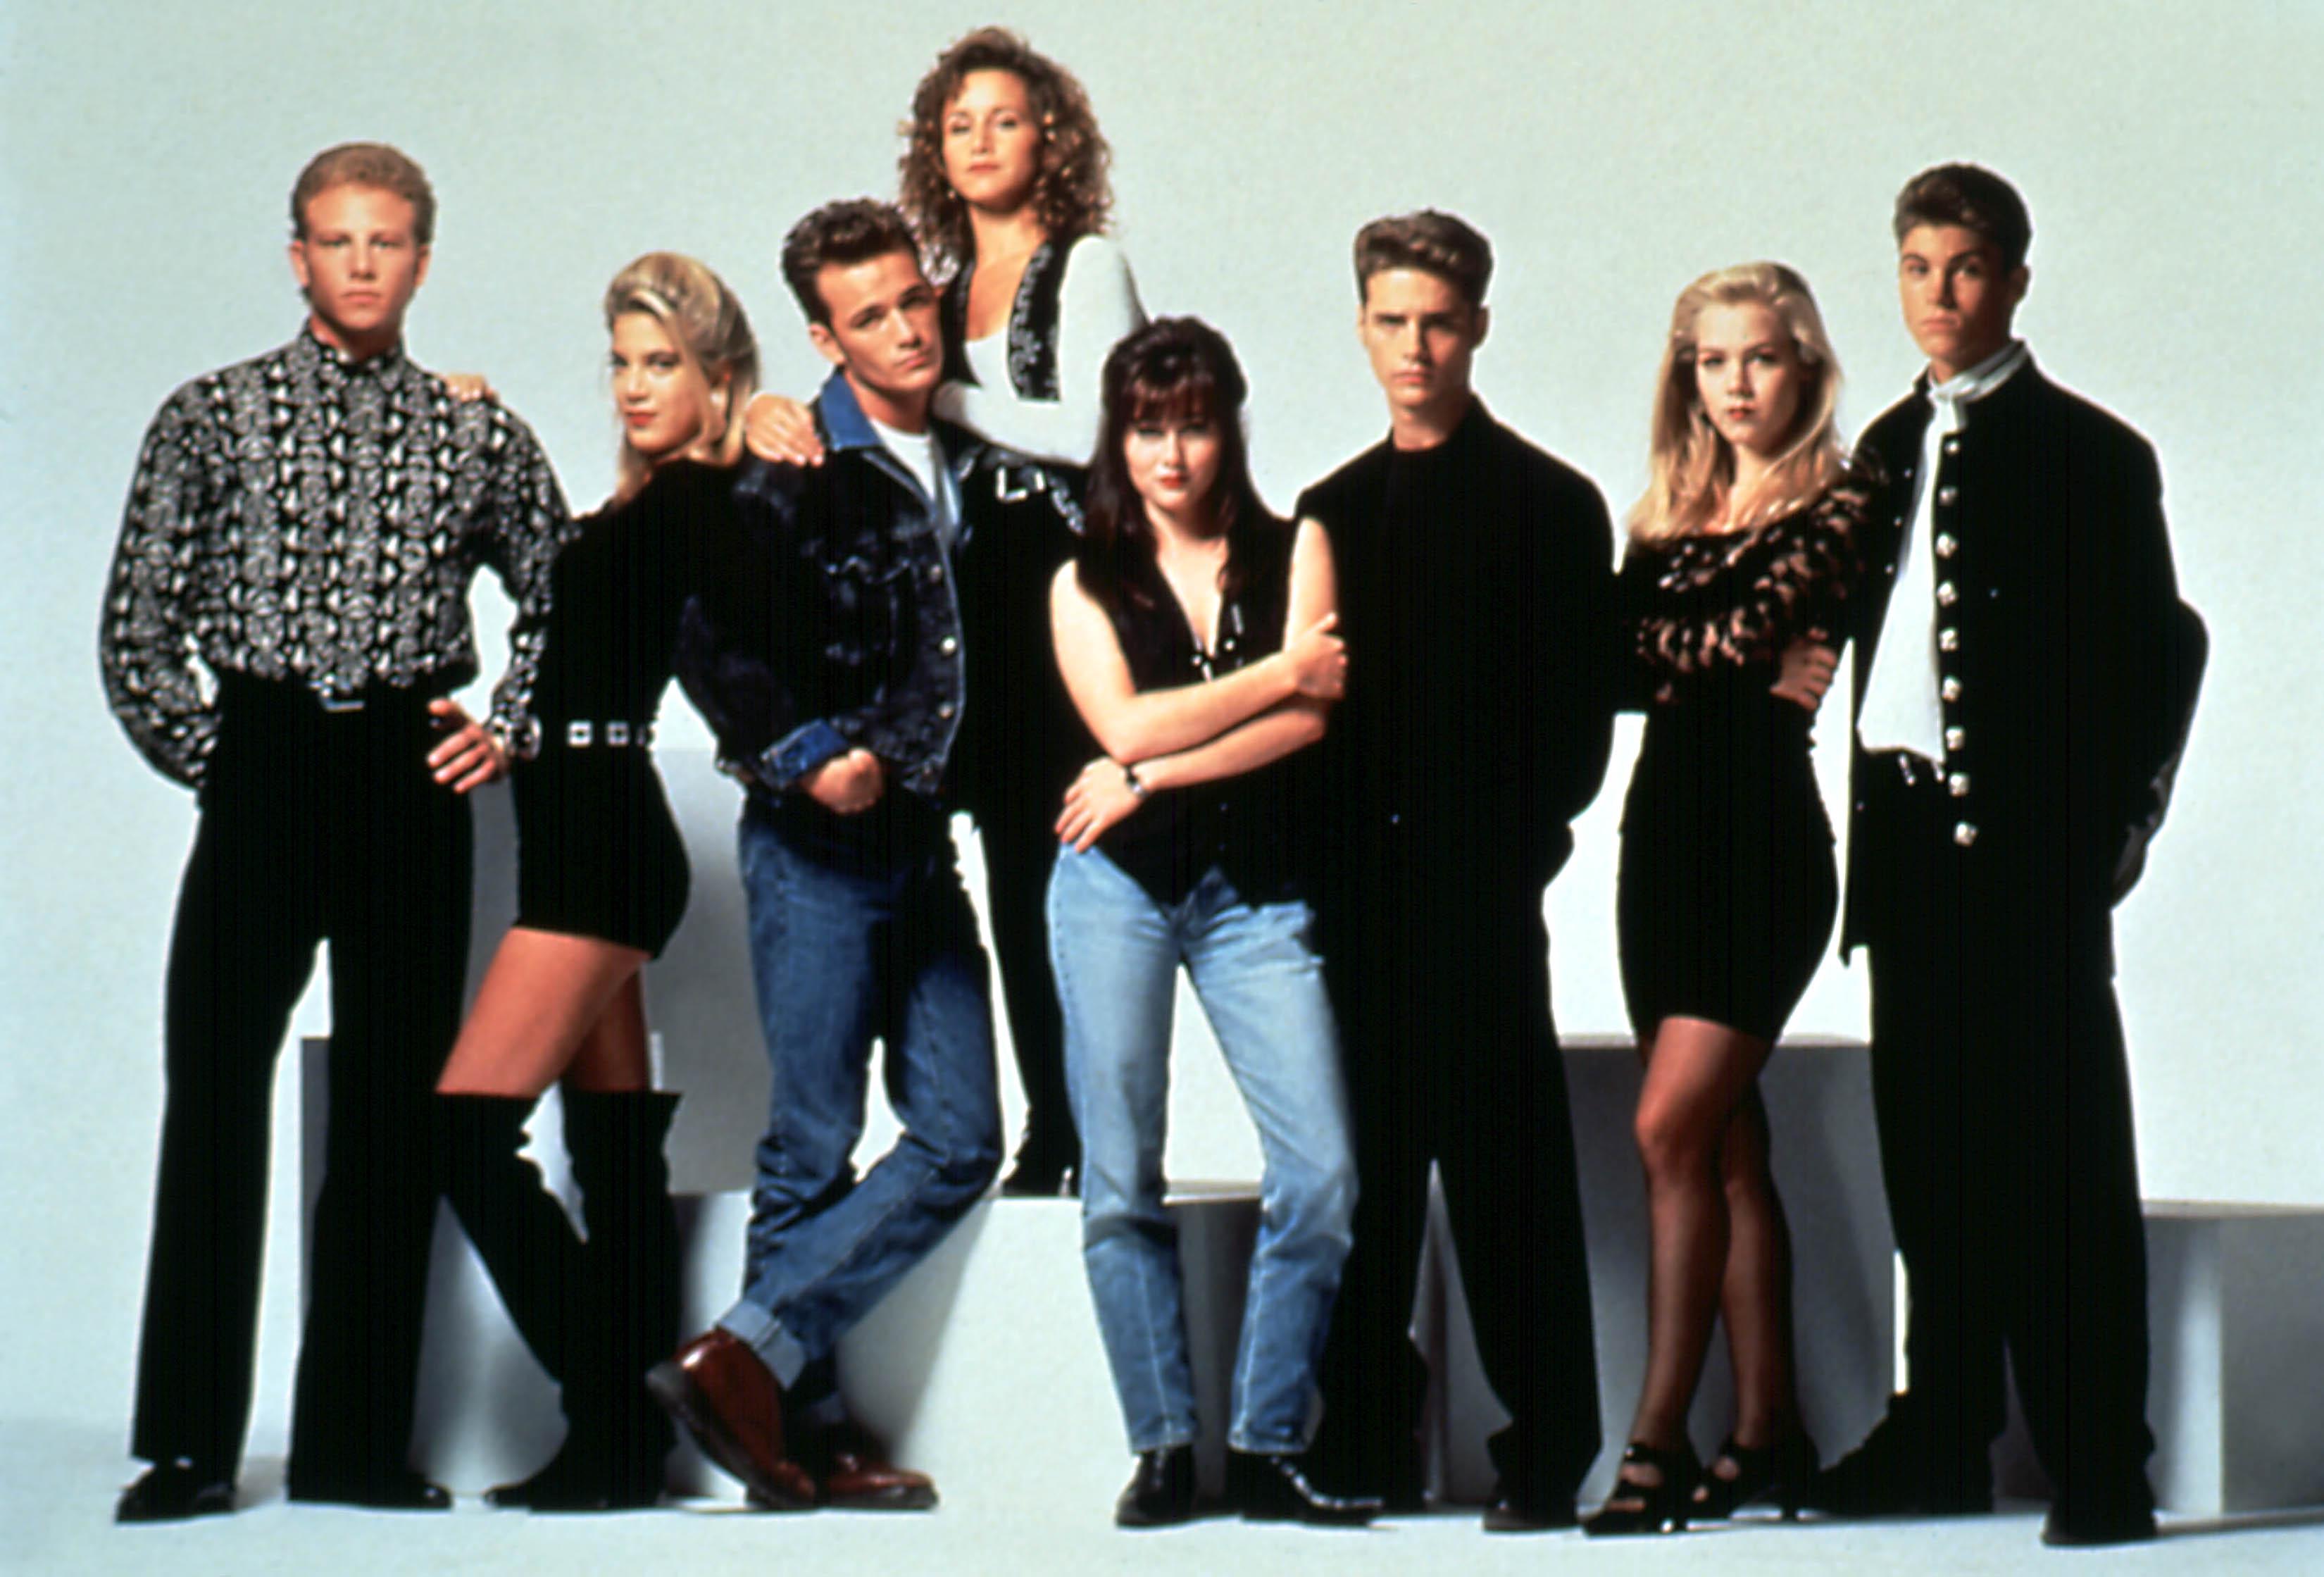 Beverly hills cast 90210 Jessica Alba